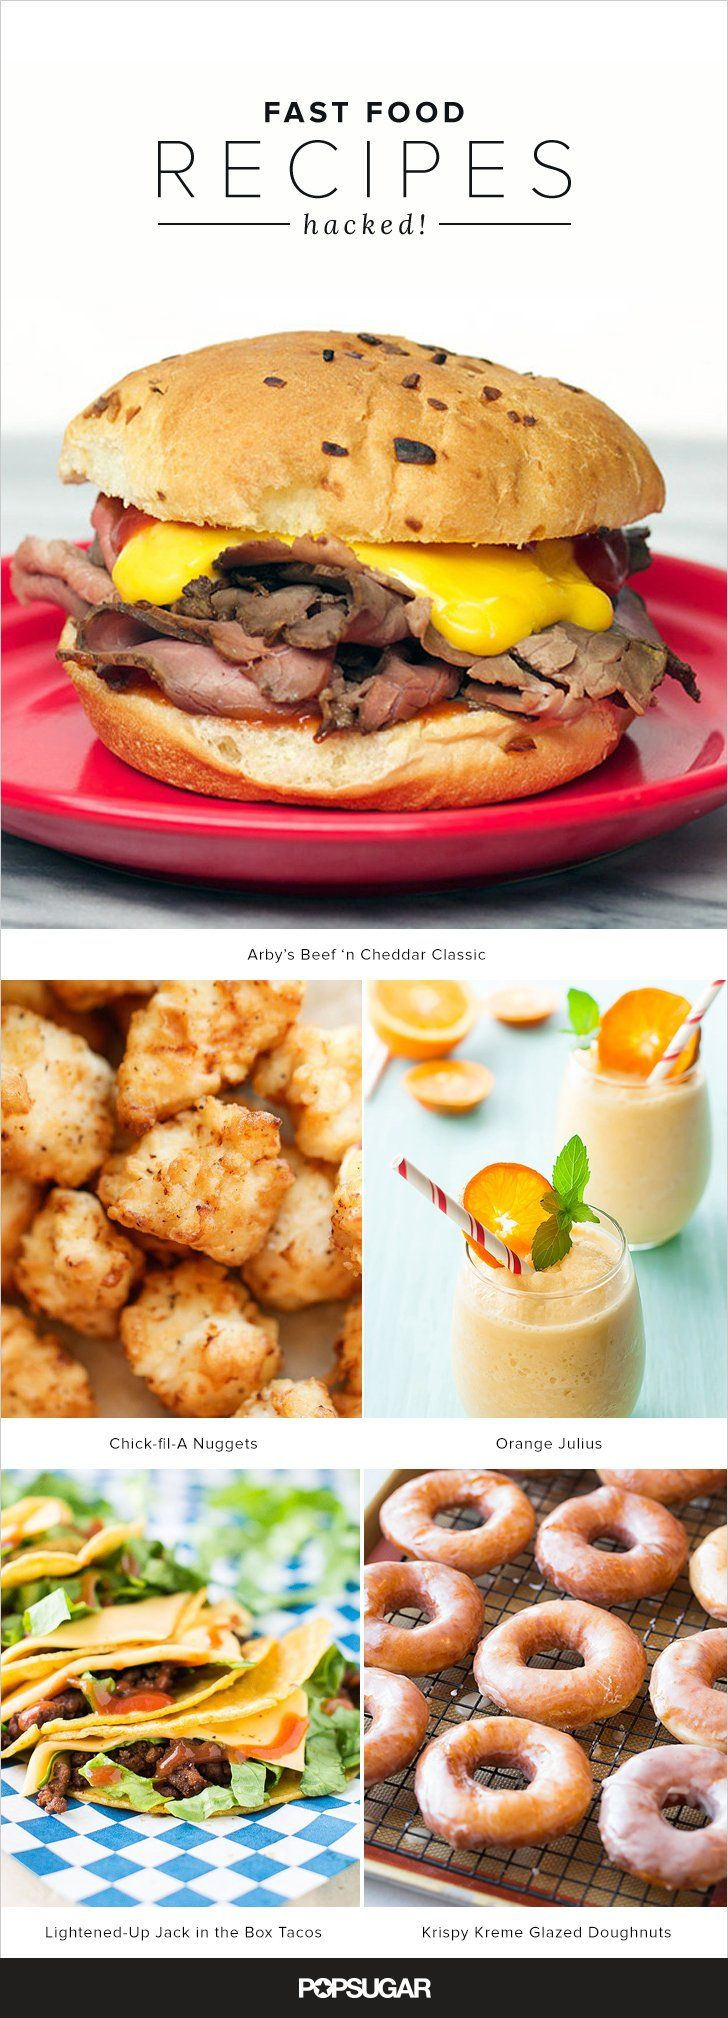 233 best fast food hacks images on pinterest food hacks recipes 27 fast food recipes hacked forumfinder Choice Image